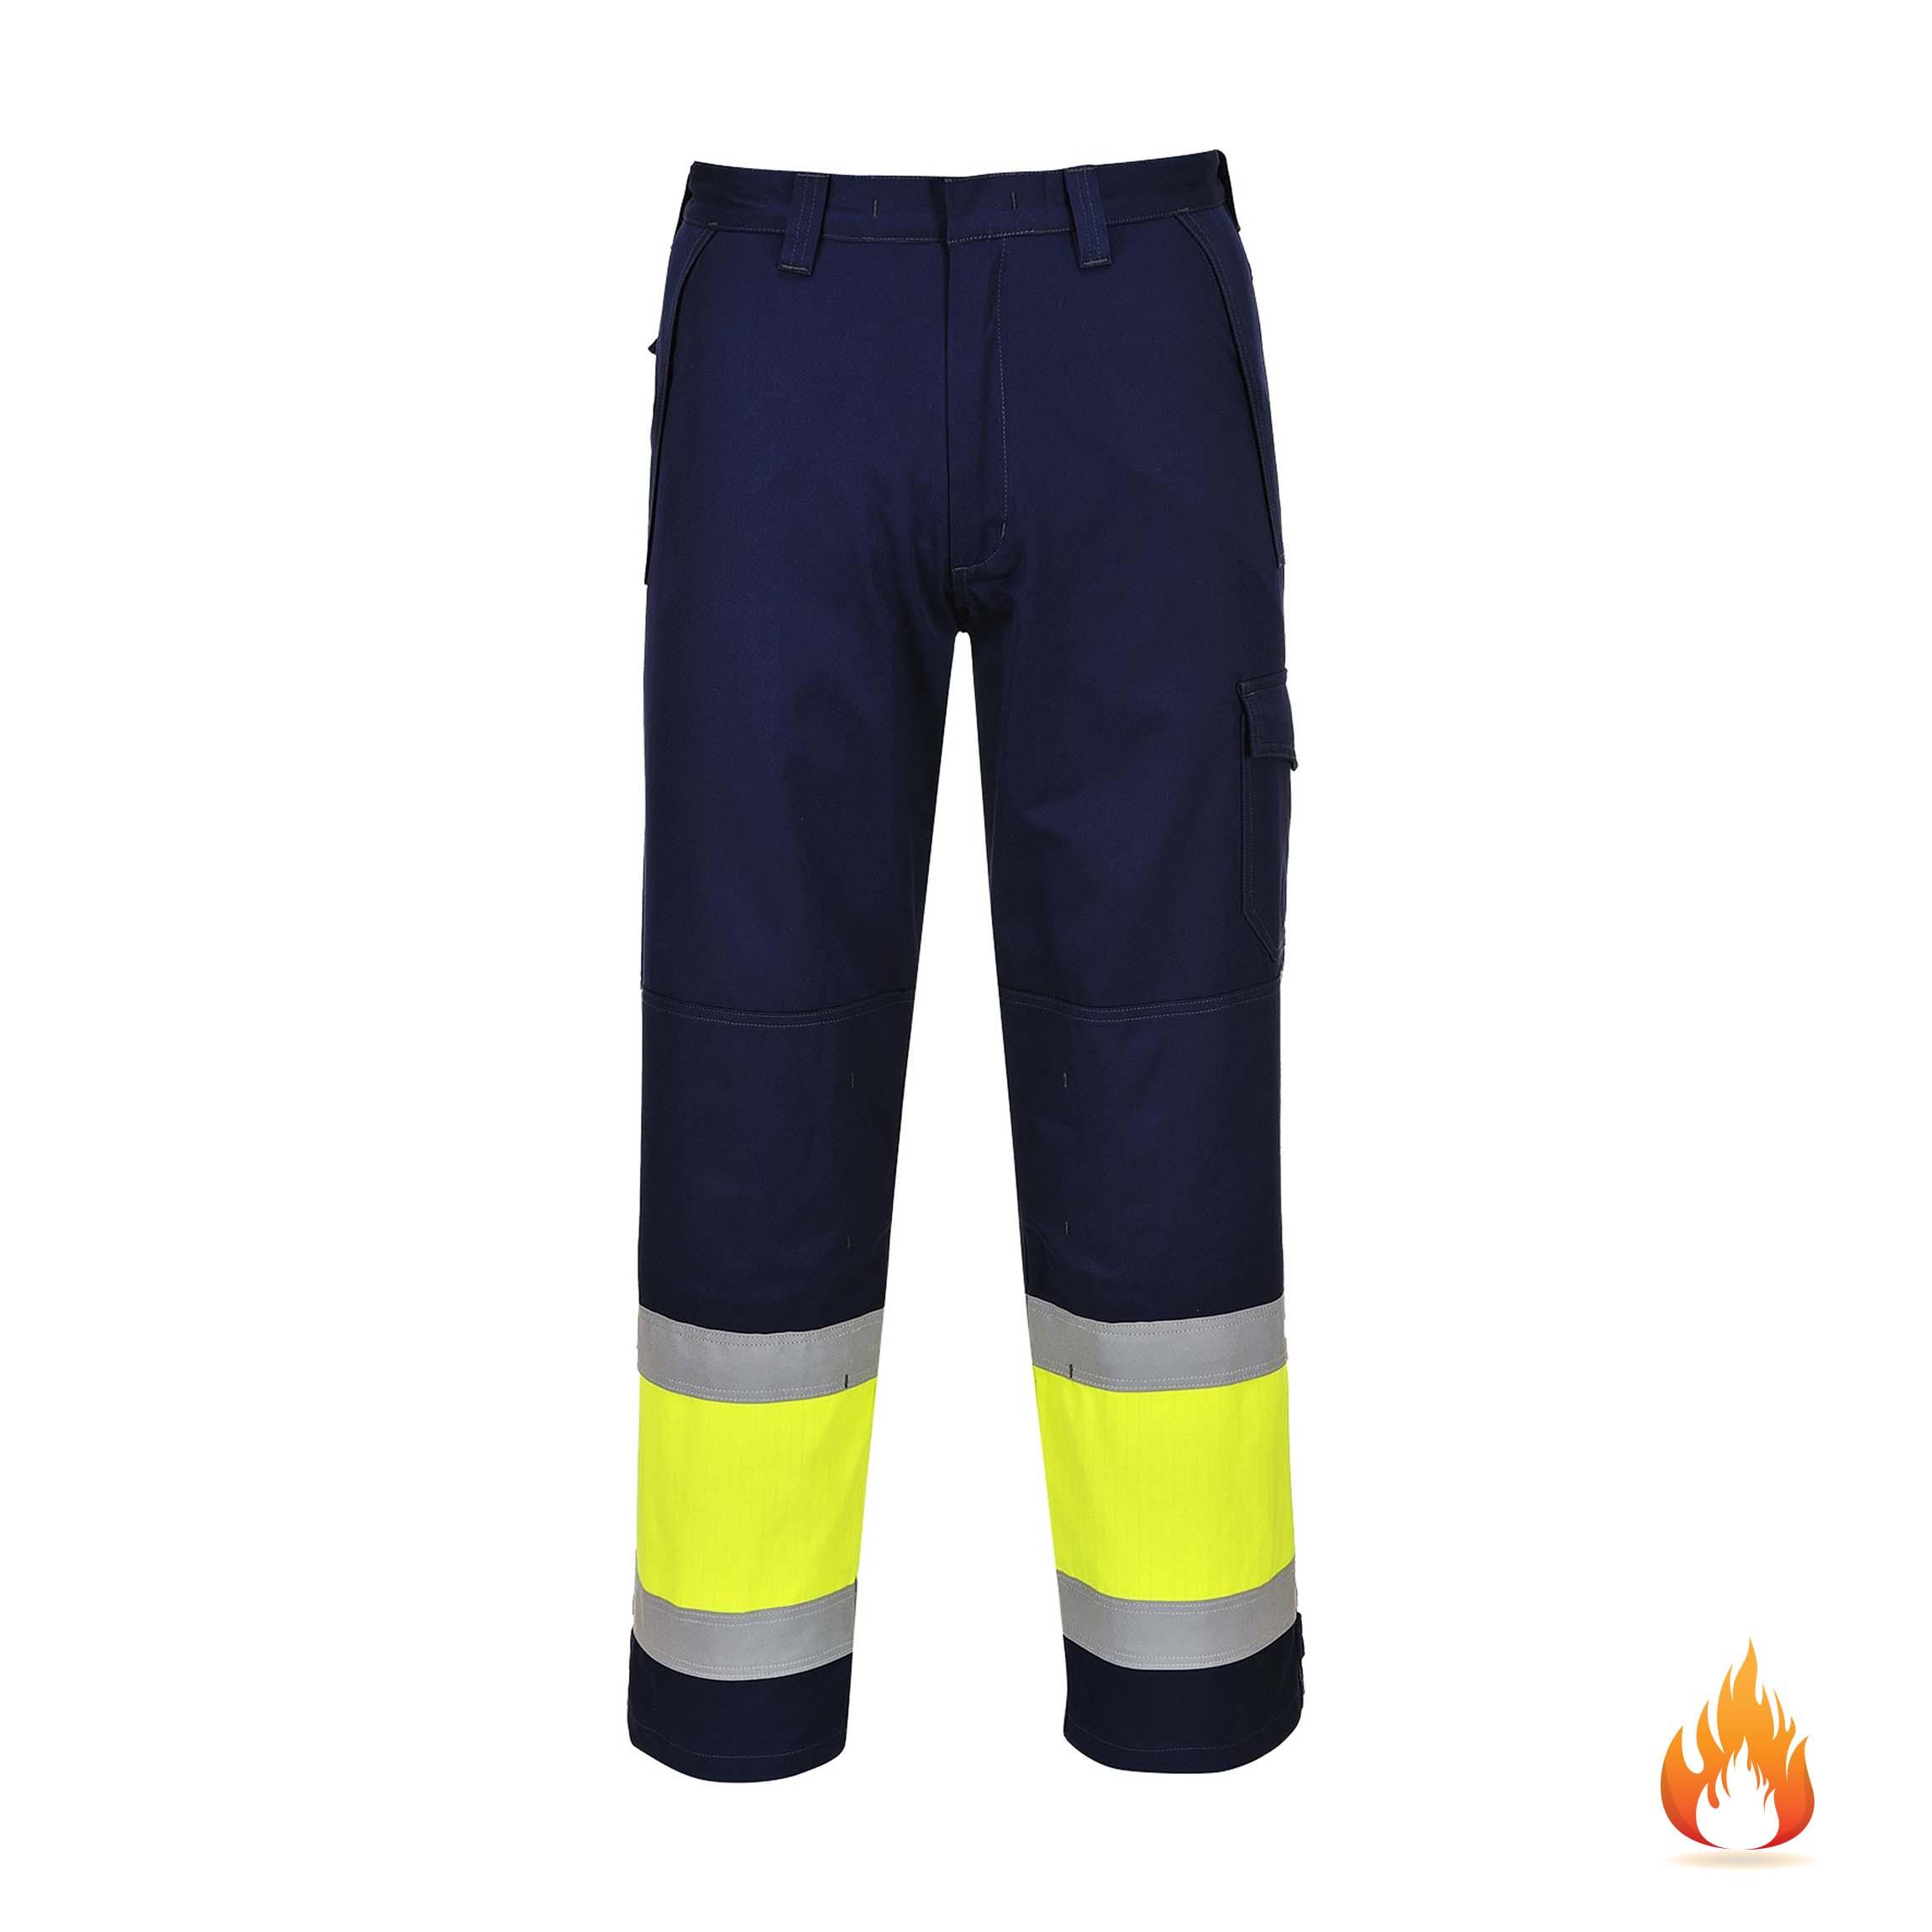 Vatrootporne hlače MV26